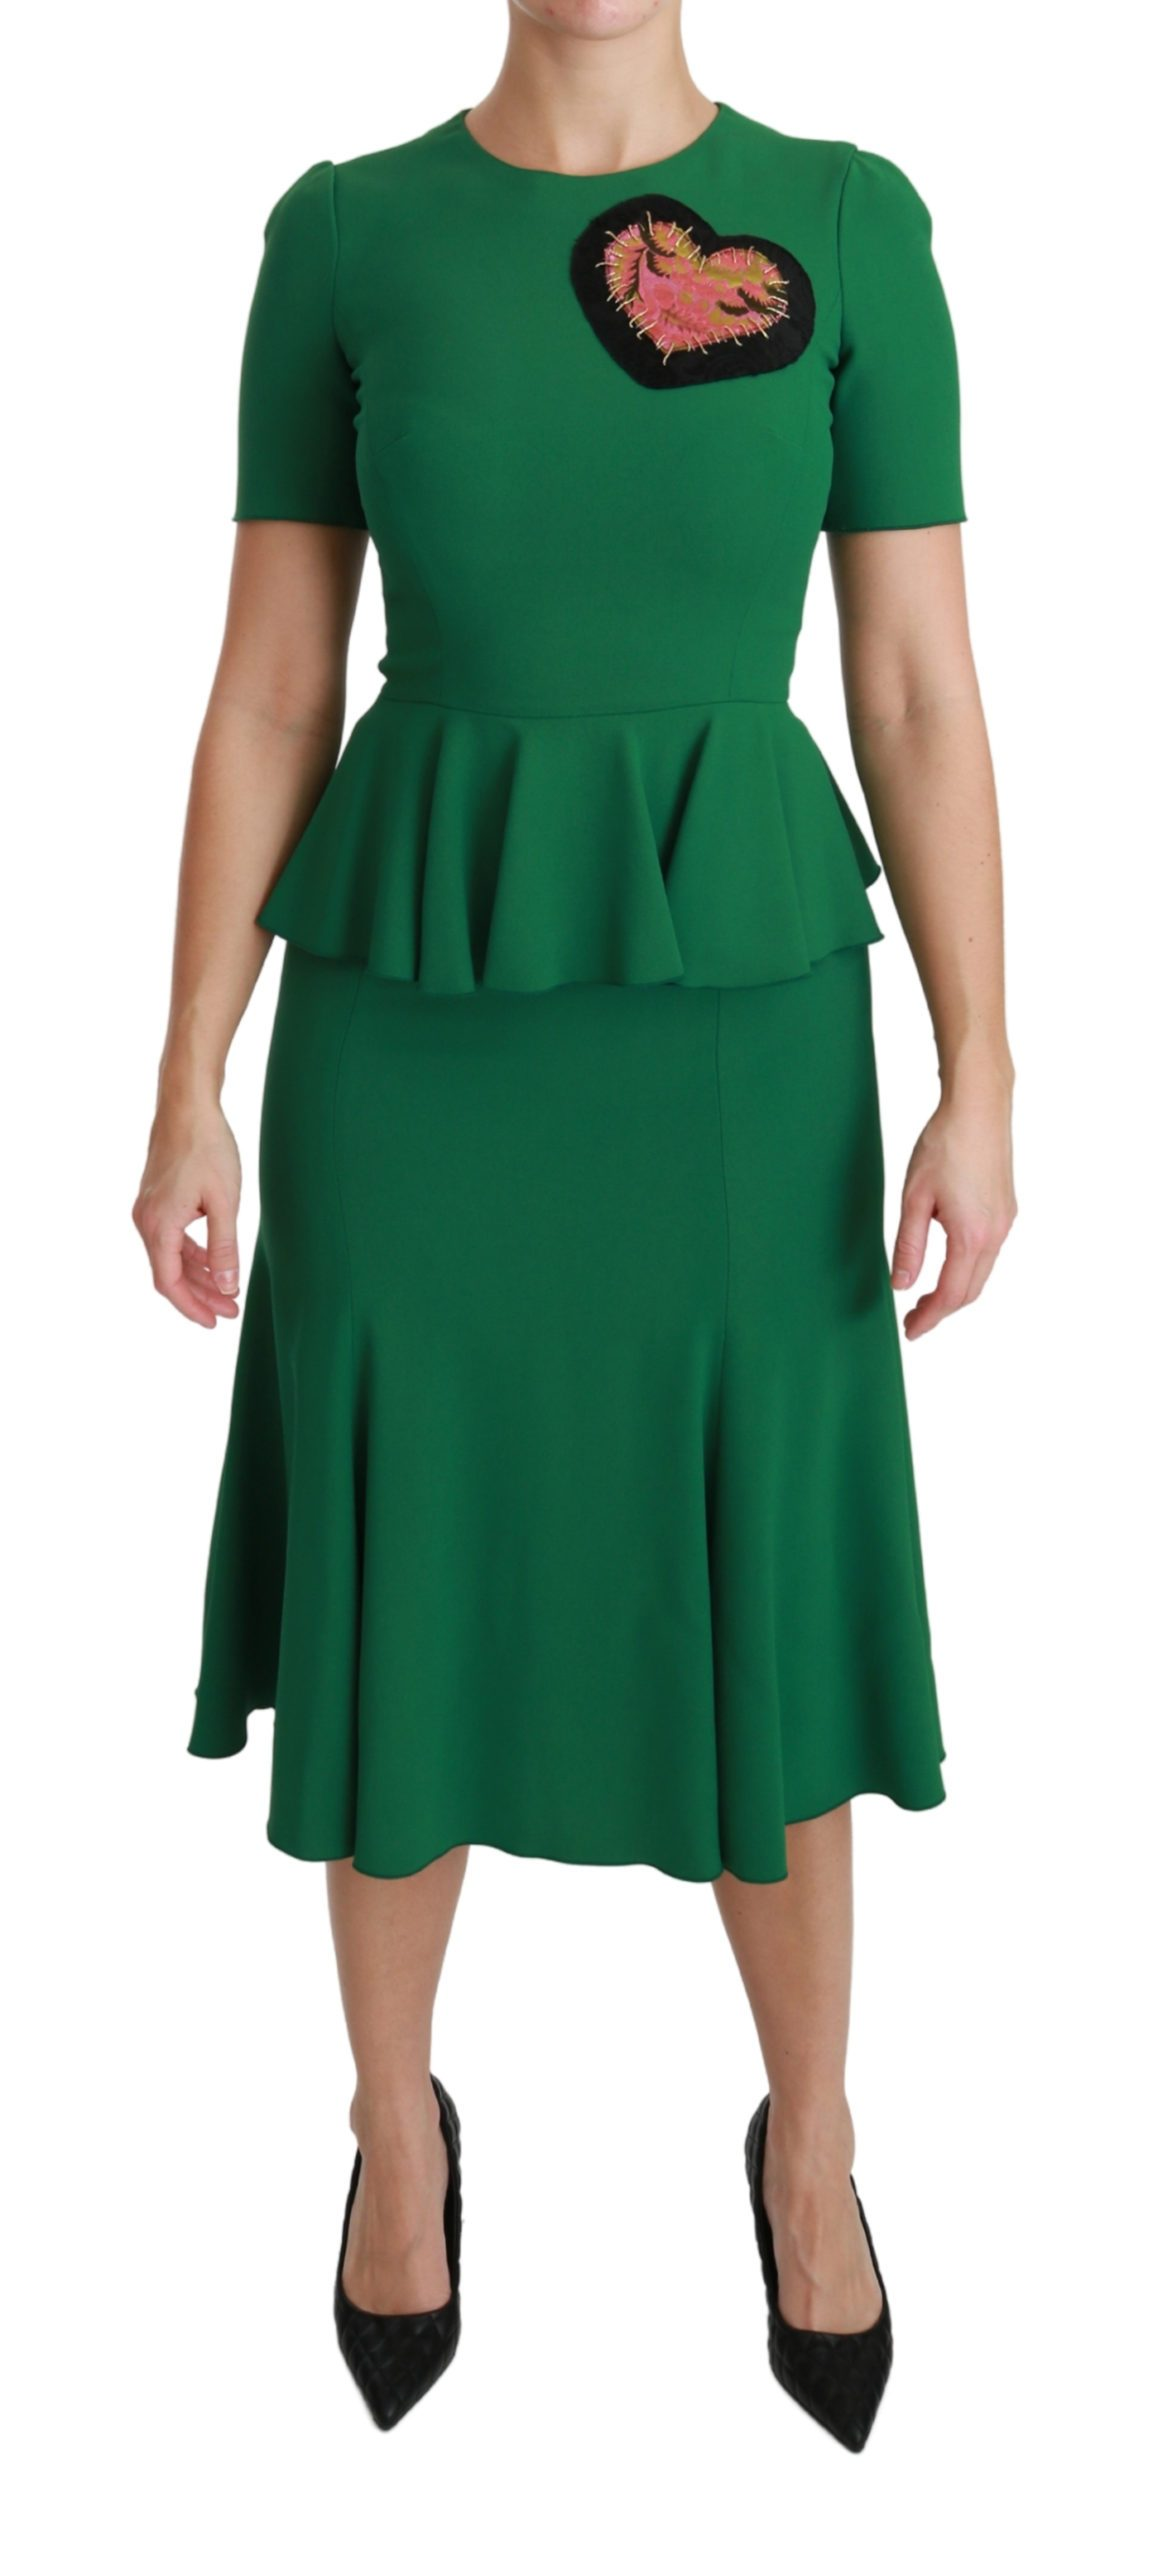 Dolce & Gabbana Women's Heart Patch Mermaid Midi Dress Green DR2511 - IT38 | S